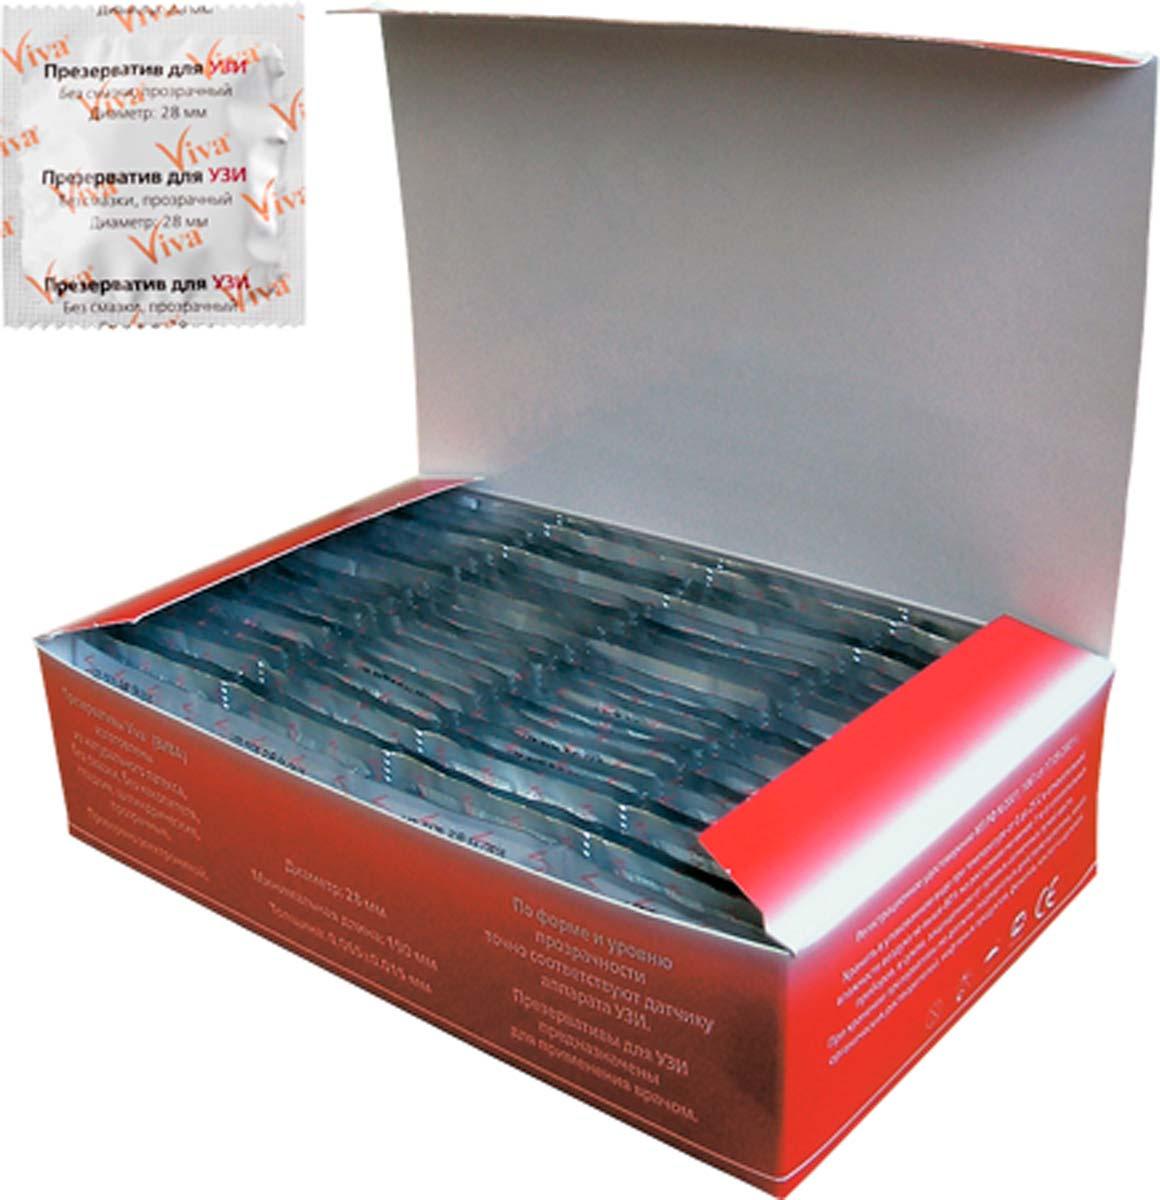 VIVA Презервативы для УЗИ, 100 шт #1